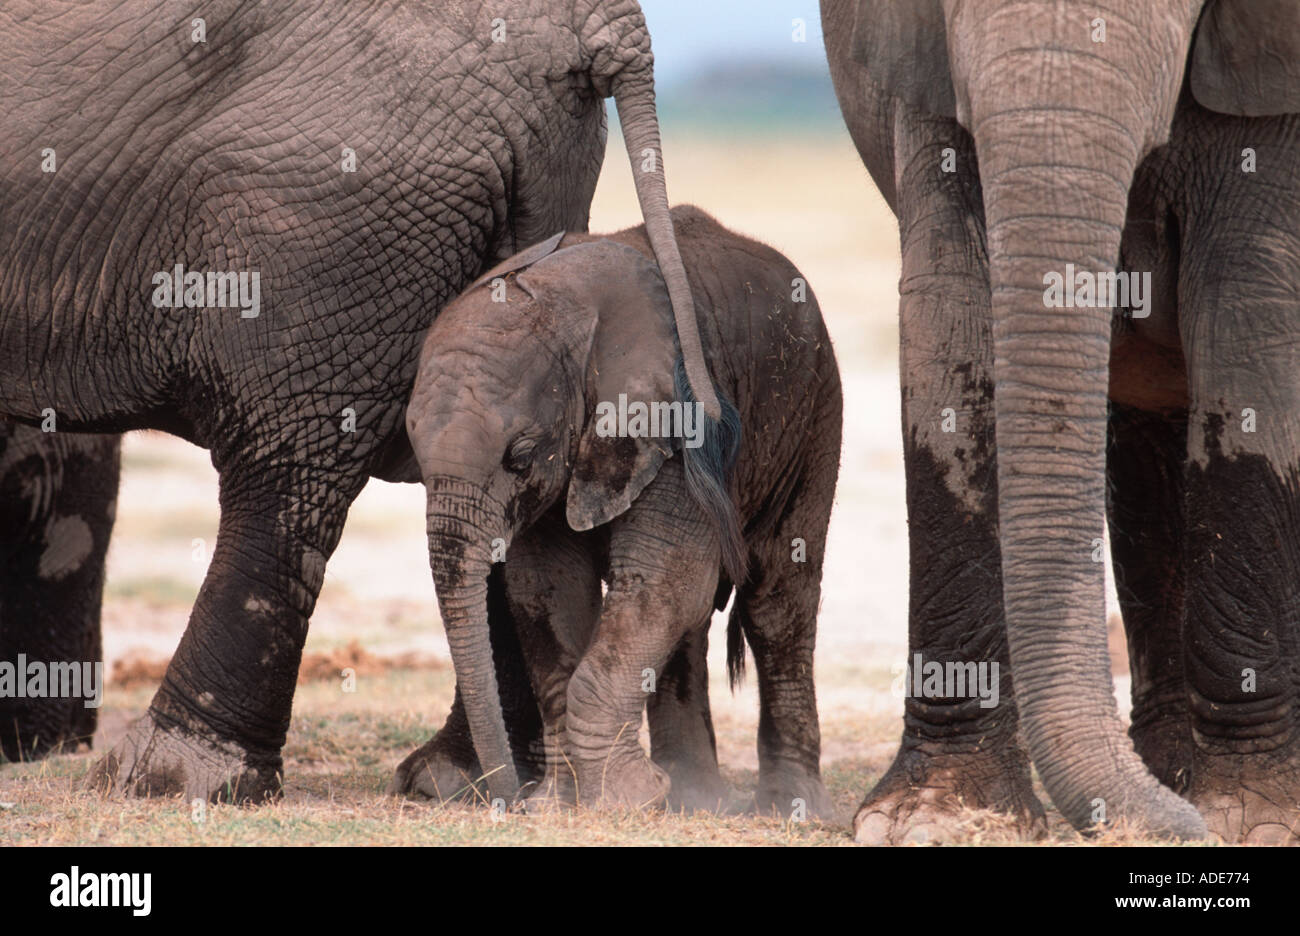 African elephant Loxodonta africana Breeding herd consisting of females and calves Amboseli National Park Kenya - Stock Image